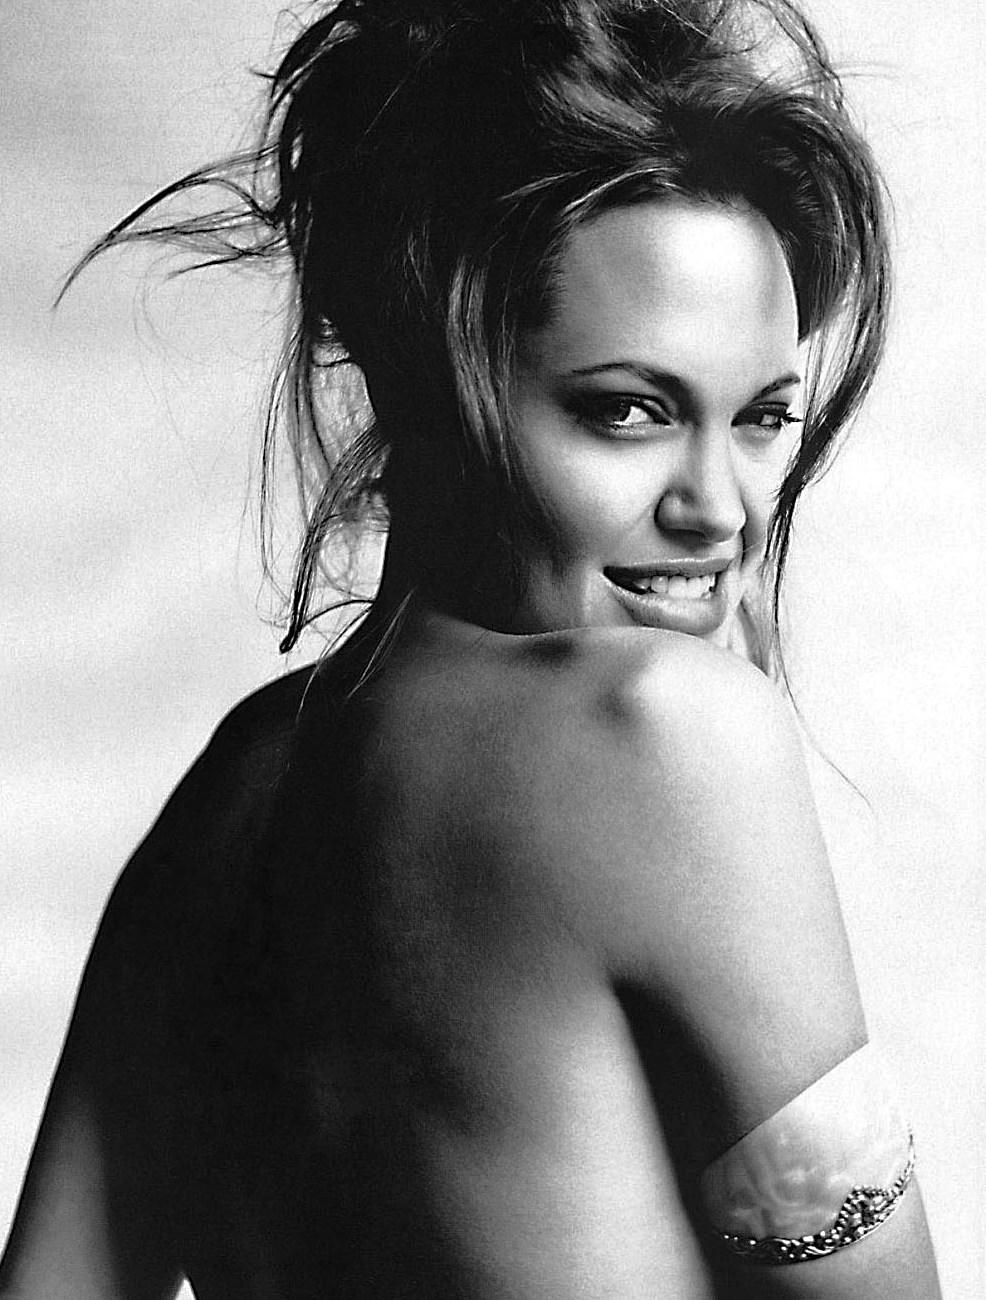 Mario-Testino-Angelina-Jolie-1.jpg